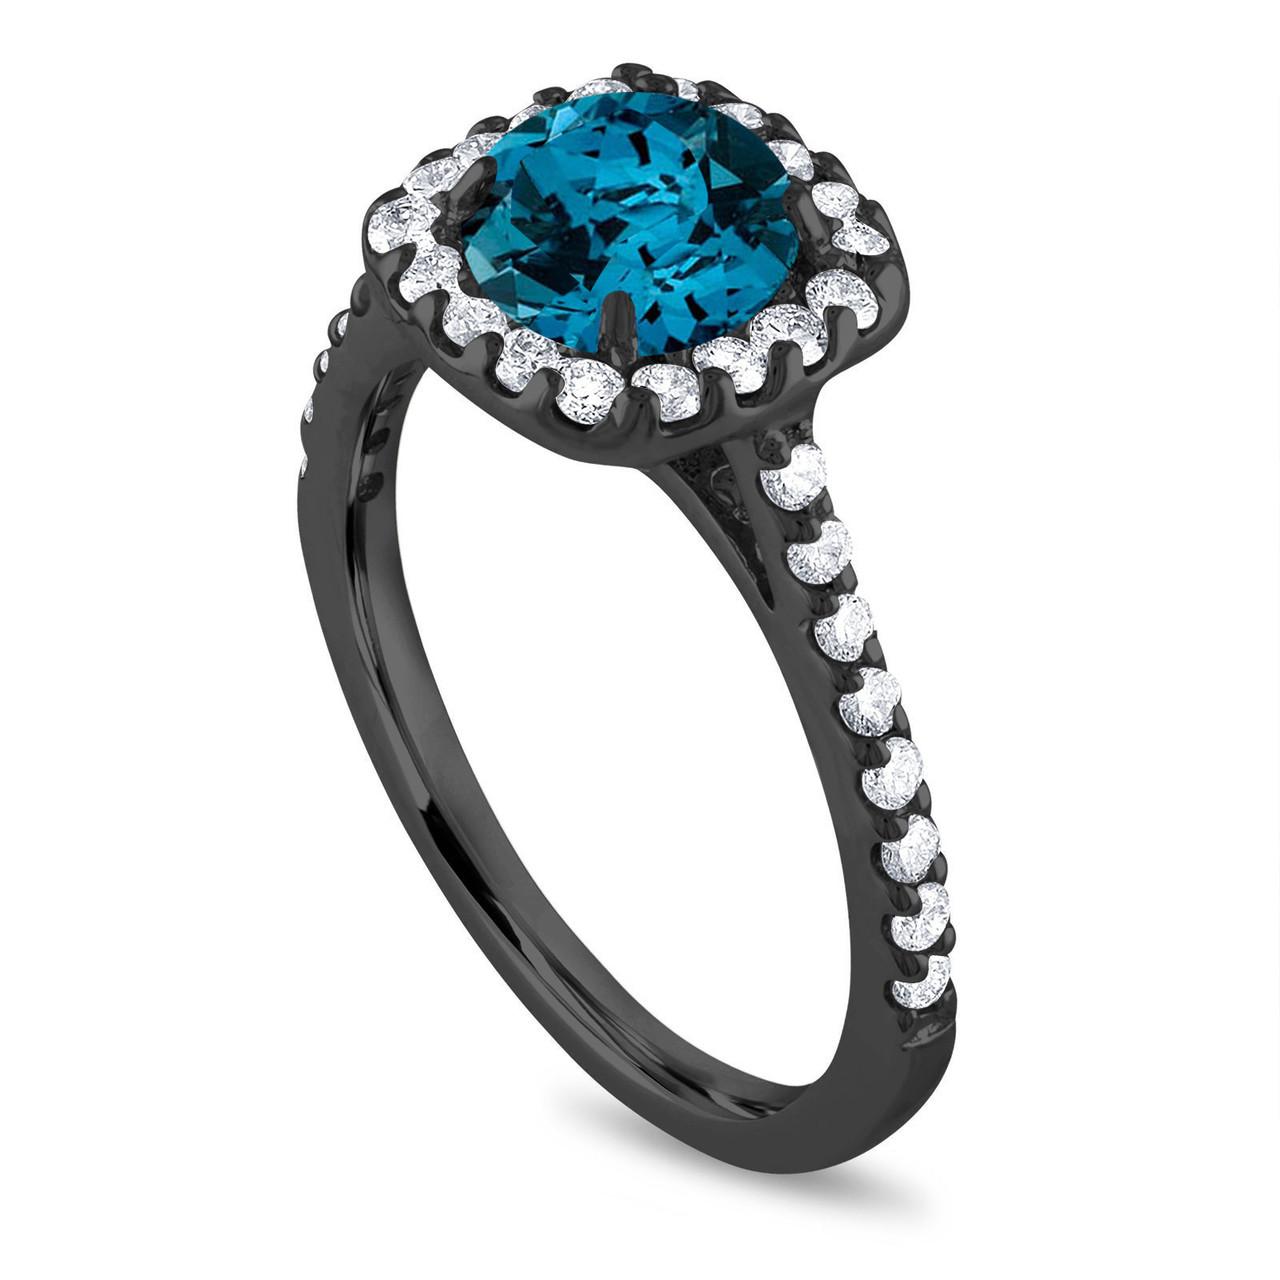 London Blue Topaz Engagement Ring Cushion Cut Engagement Ring Vintage Wedding Ring 1 58 Carat 14k Black Gold Certified Halo Pave Unique